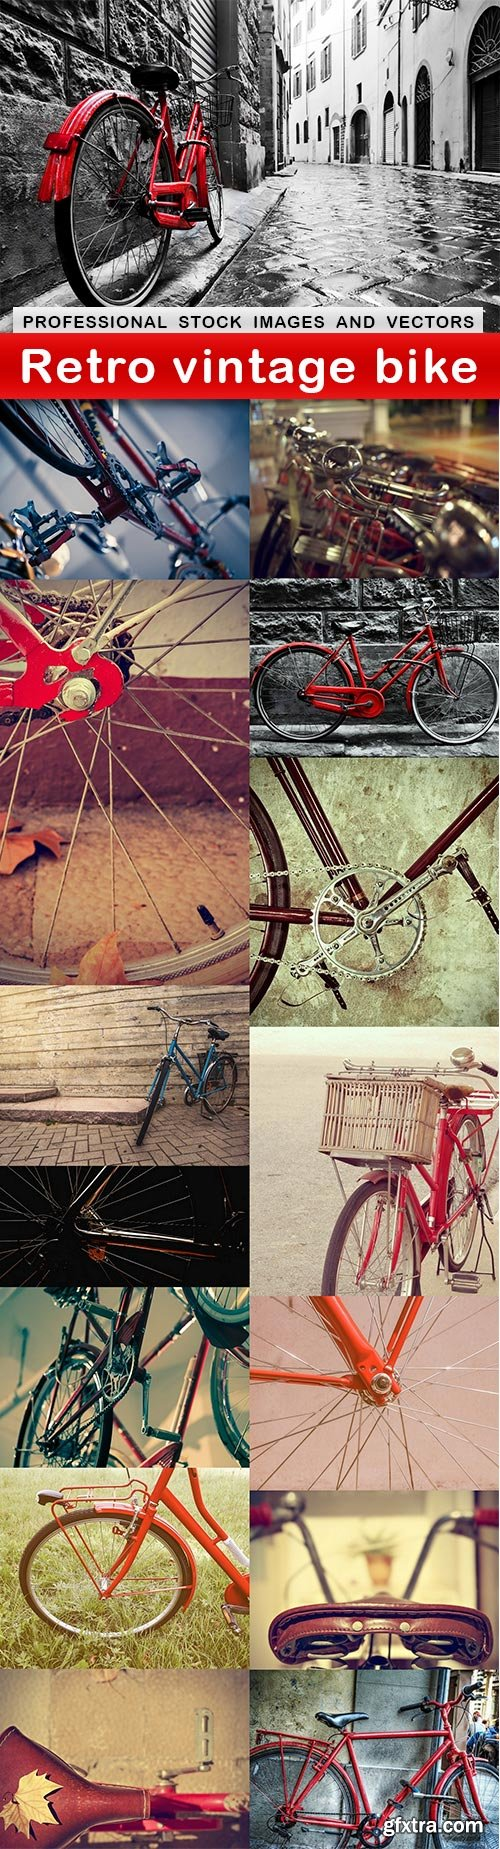 Retro vintage bike - 15 UHQ JPEG